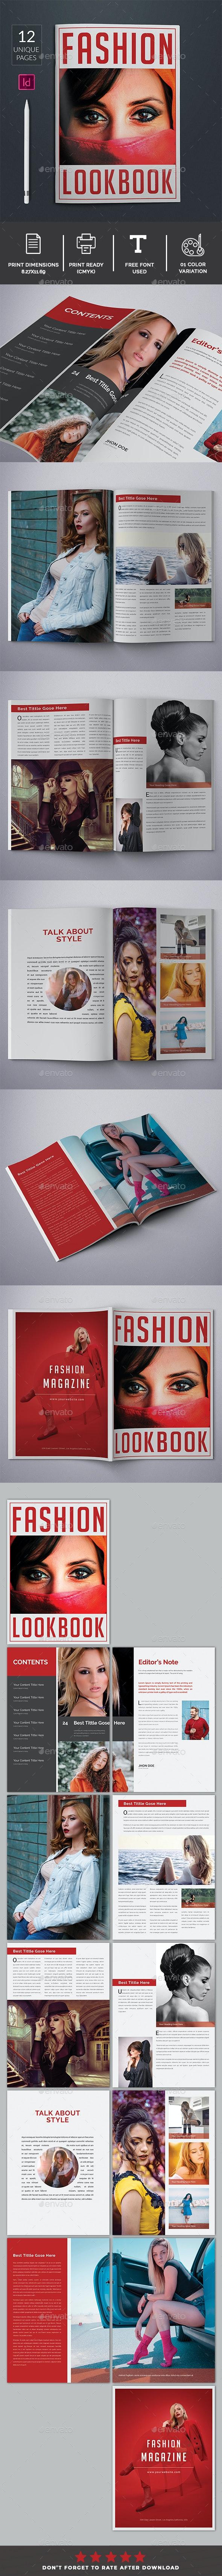 Magazine Newsletter - Magazines Print Templates